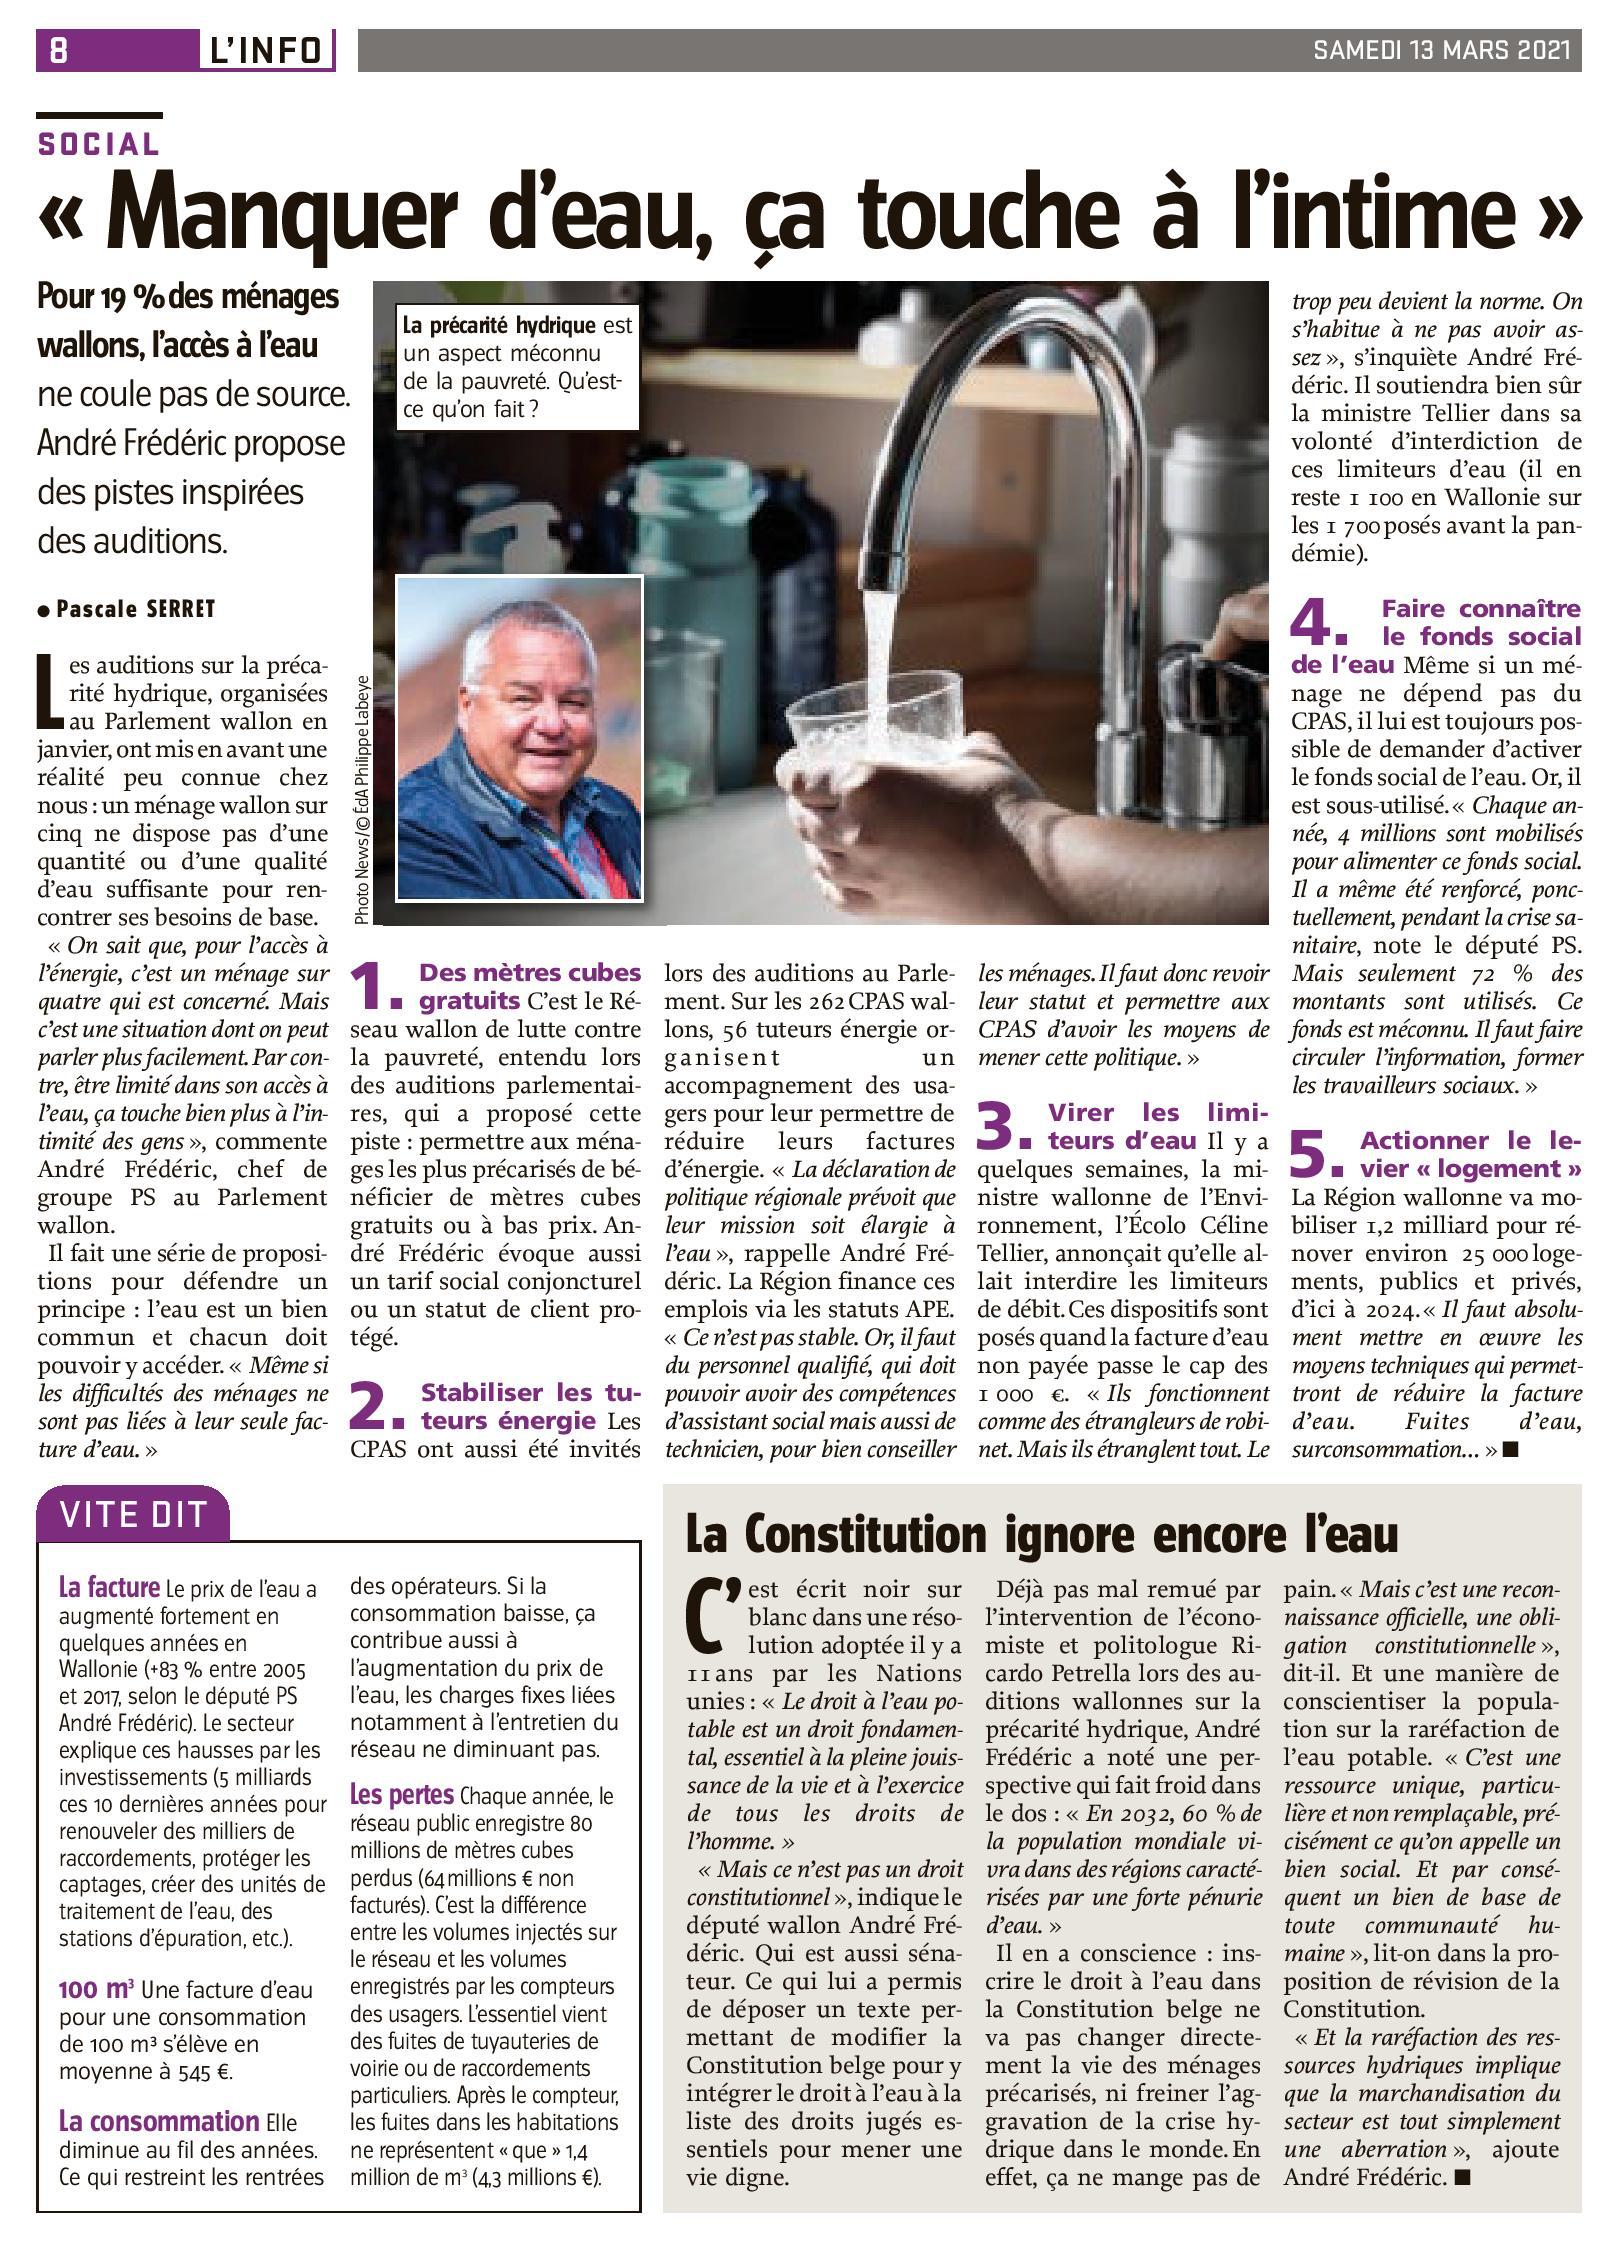 presse_du 13 03 2021 - L'Avenir